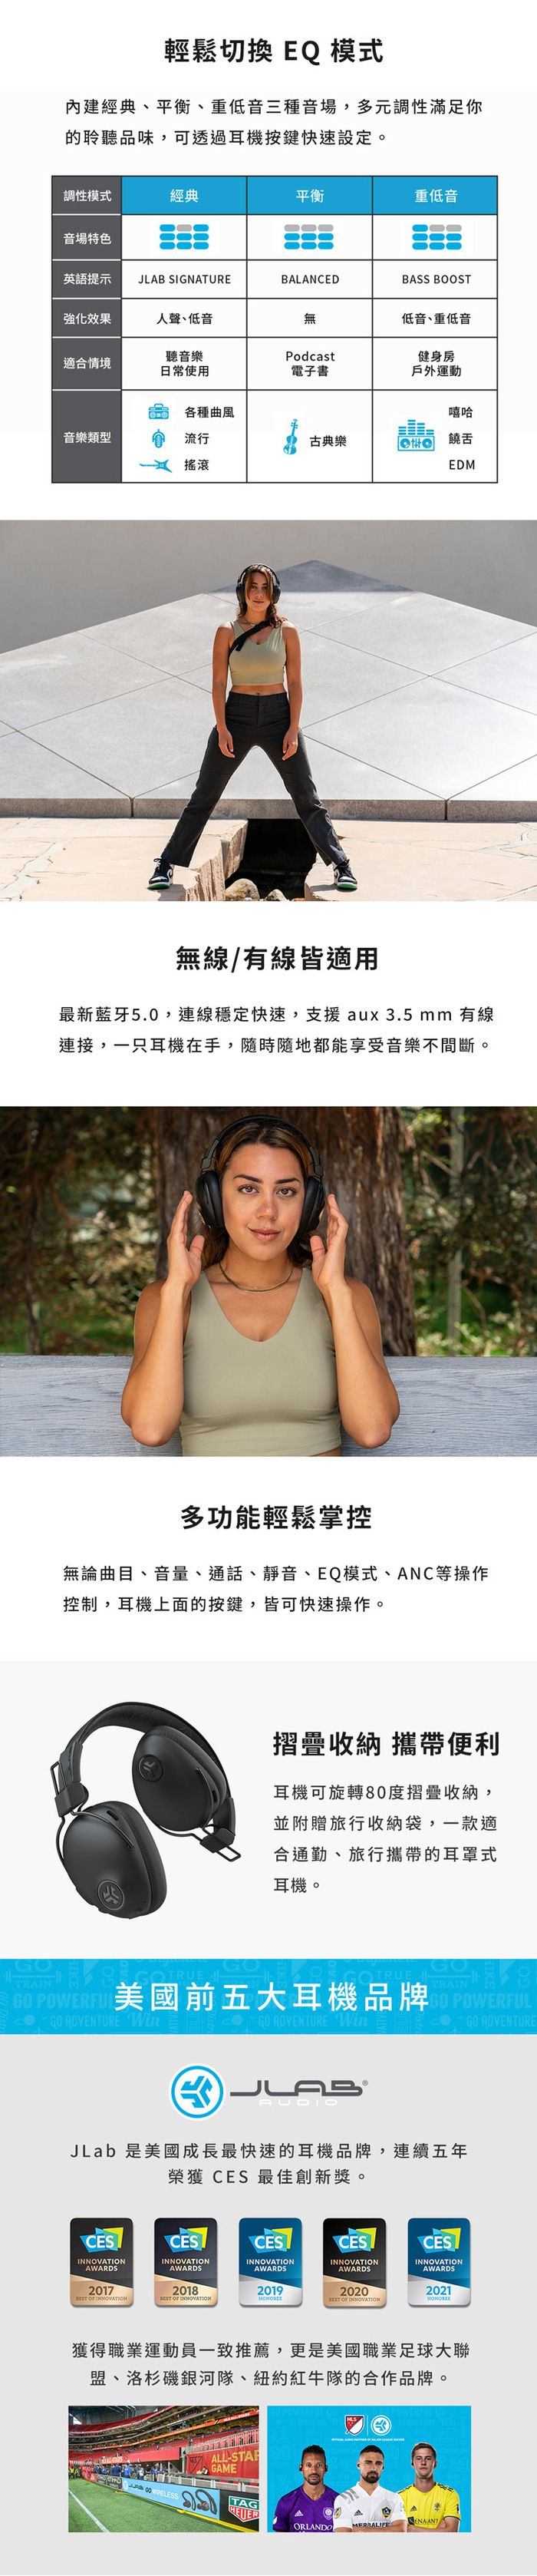 JLab|STUDIO PRO ANC 無線耳罩式降噪藍牙耳機